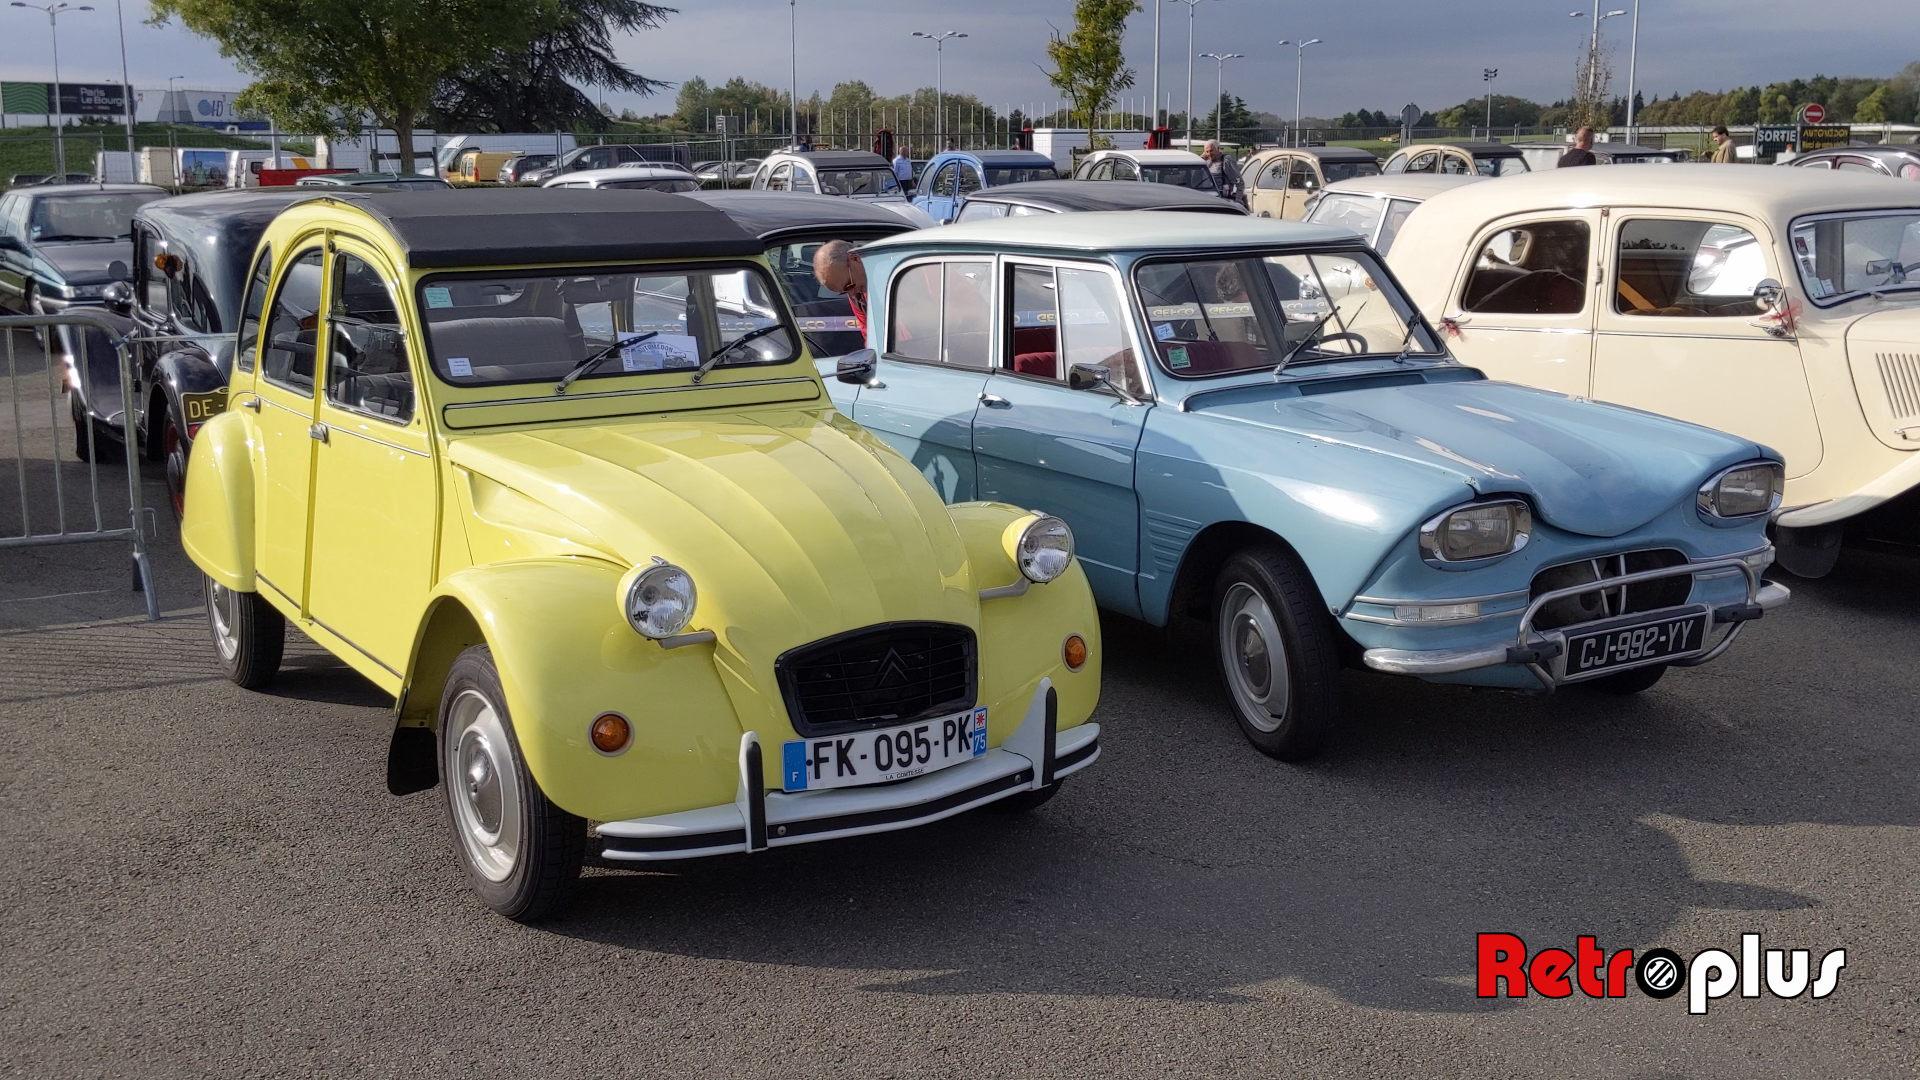 Automedon2019-parkingCitroen53